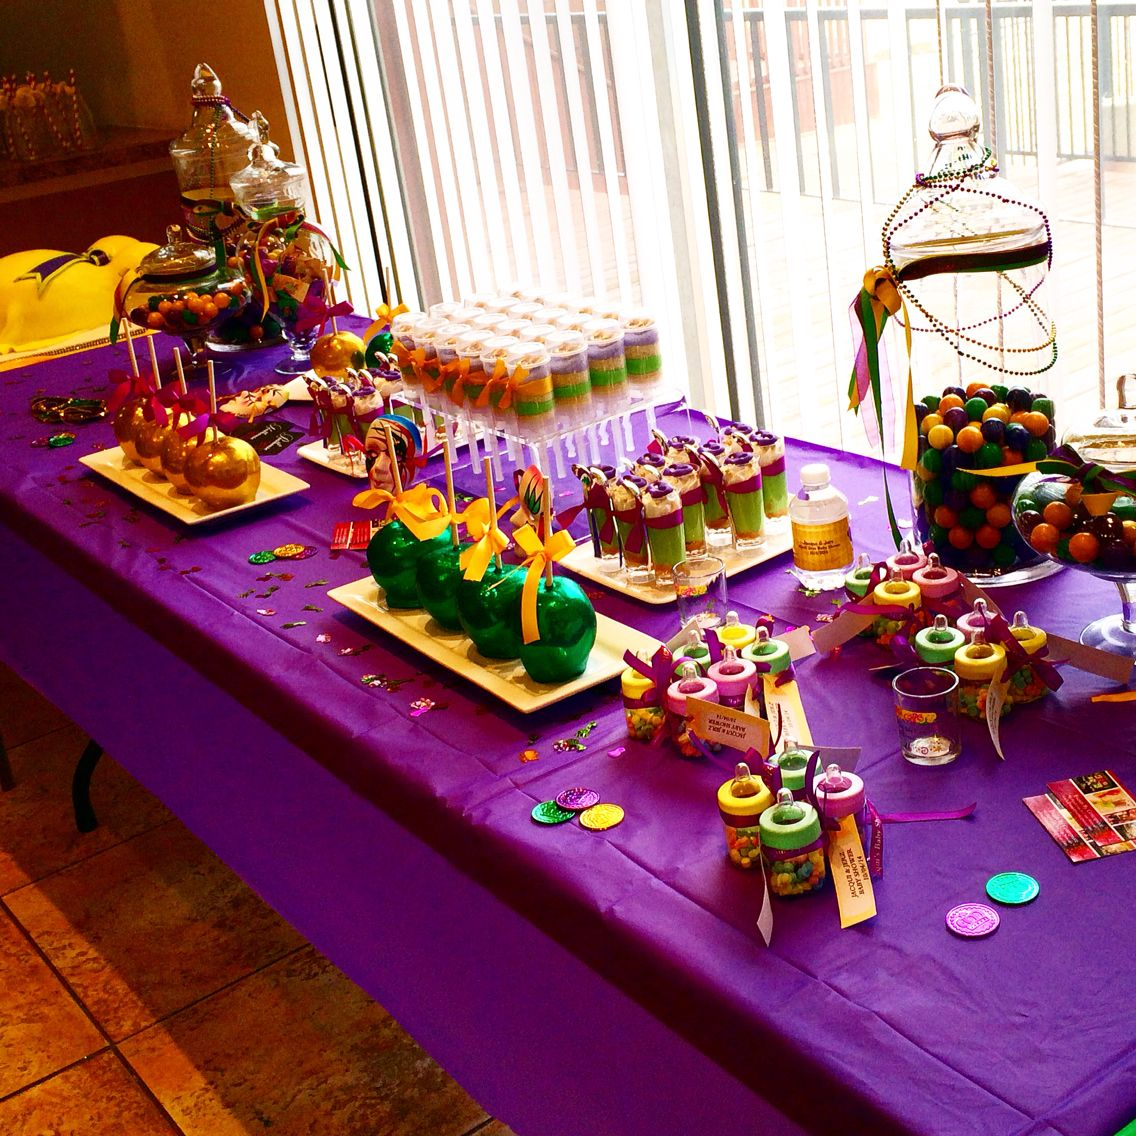 Mardi Gras Baby Shower Eventsbycenterpiece Mardi Gras Wedding Mardi Gras Party Decorations Mardi Gras Decorations